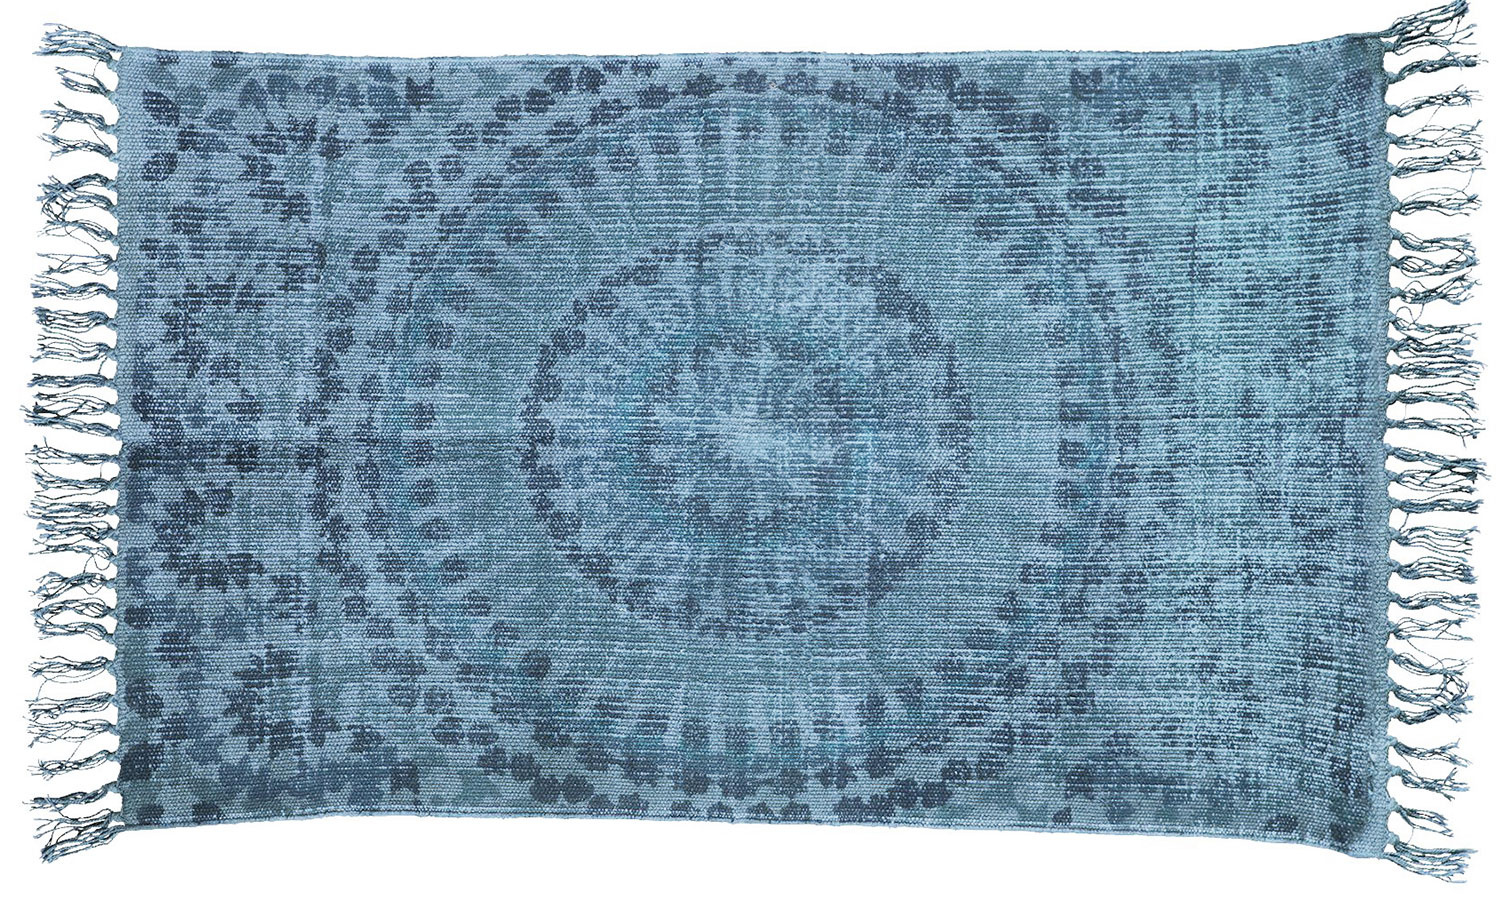 Koberec House Doctor Pix blue sdžínsovým vzhľadom, bavlna, juta, 90 × 200 cm, 115,81 €, www.bellarose.sk